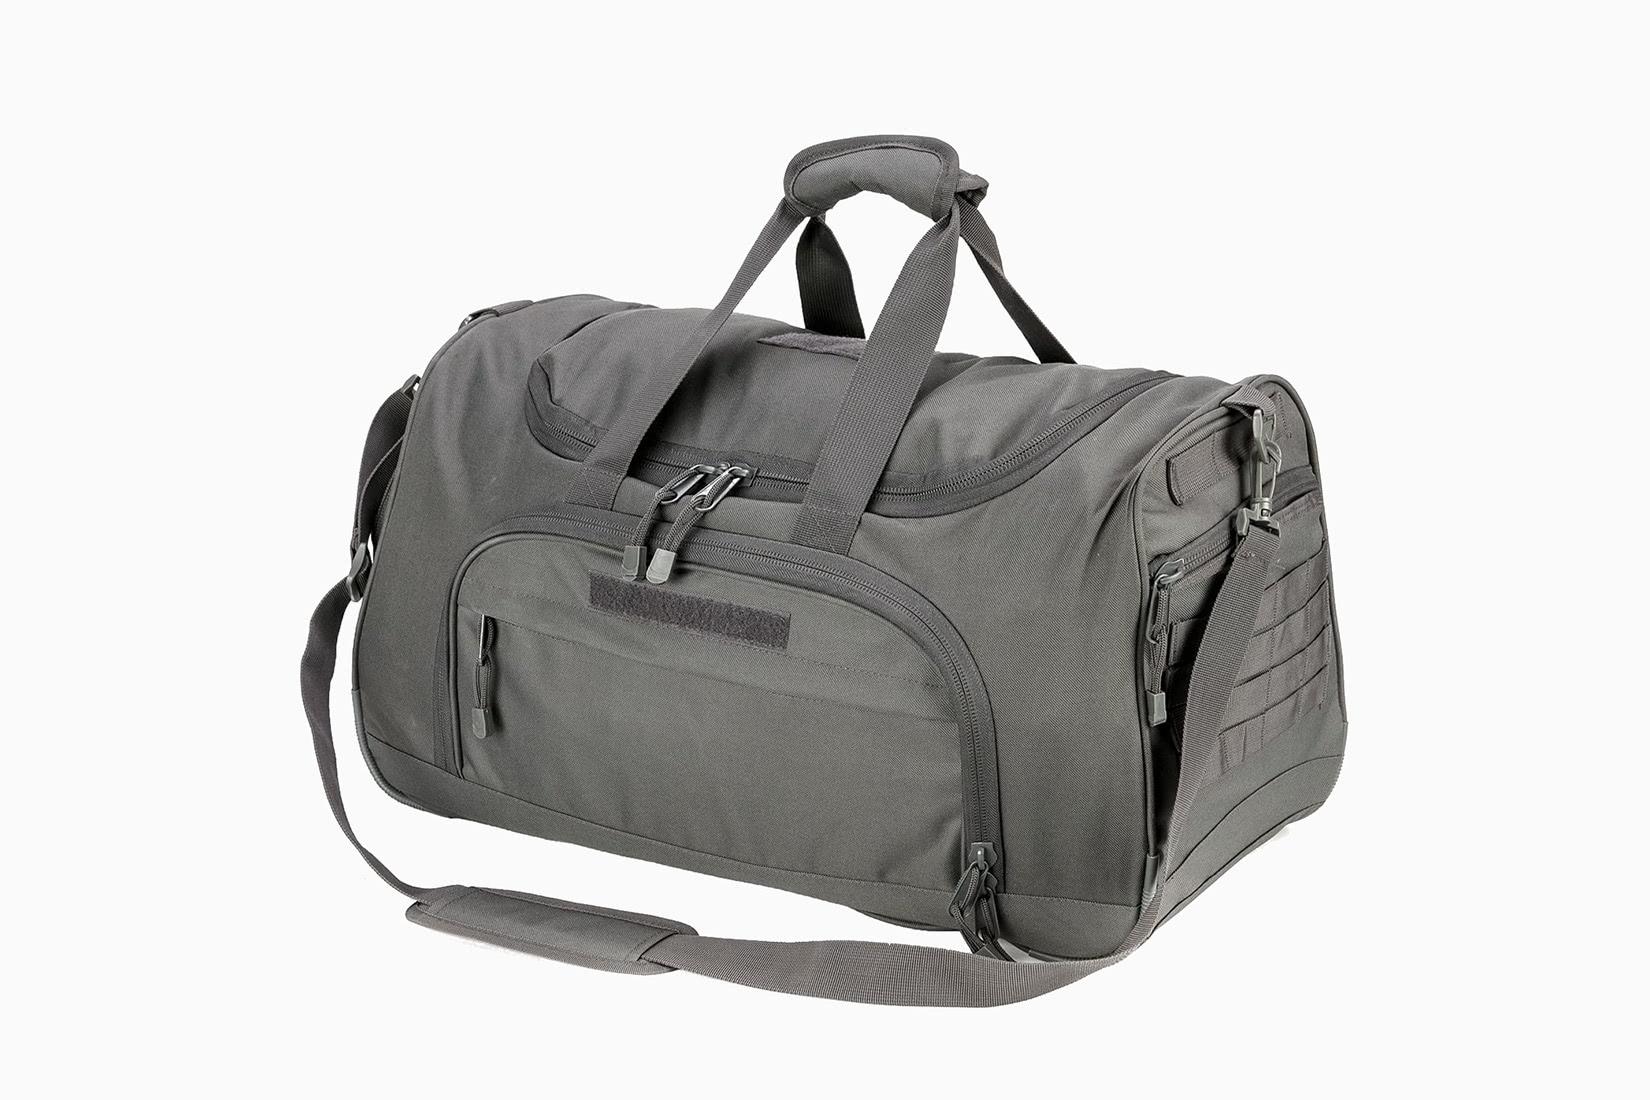 best men gym bag small wolfwarriorx duffel - Luxe Digital